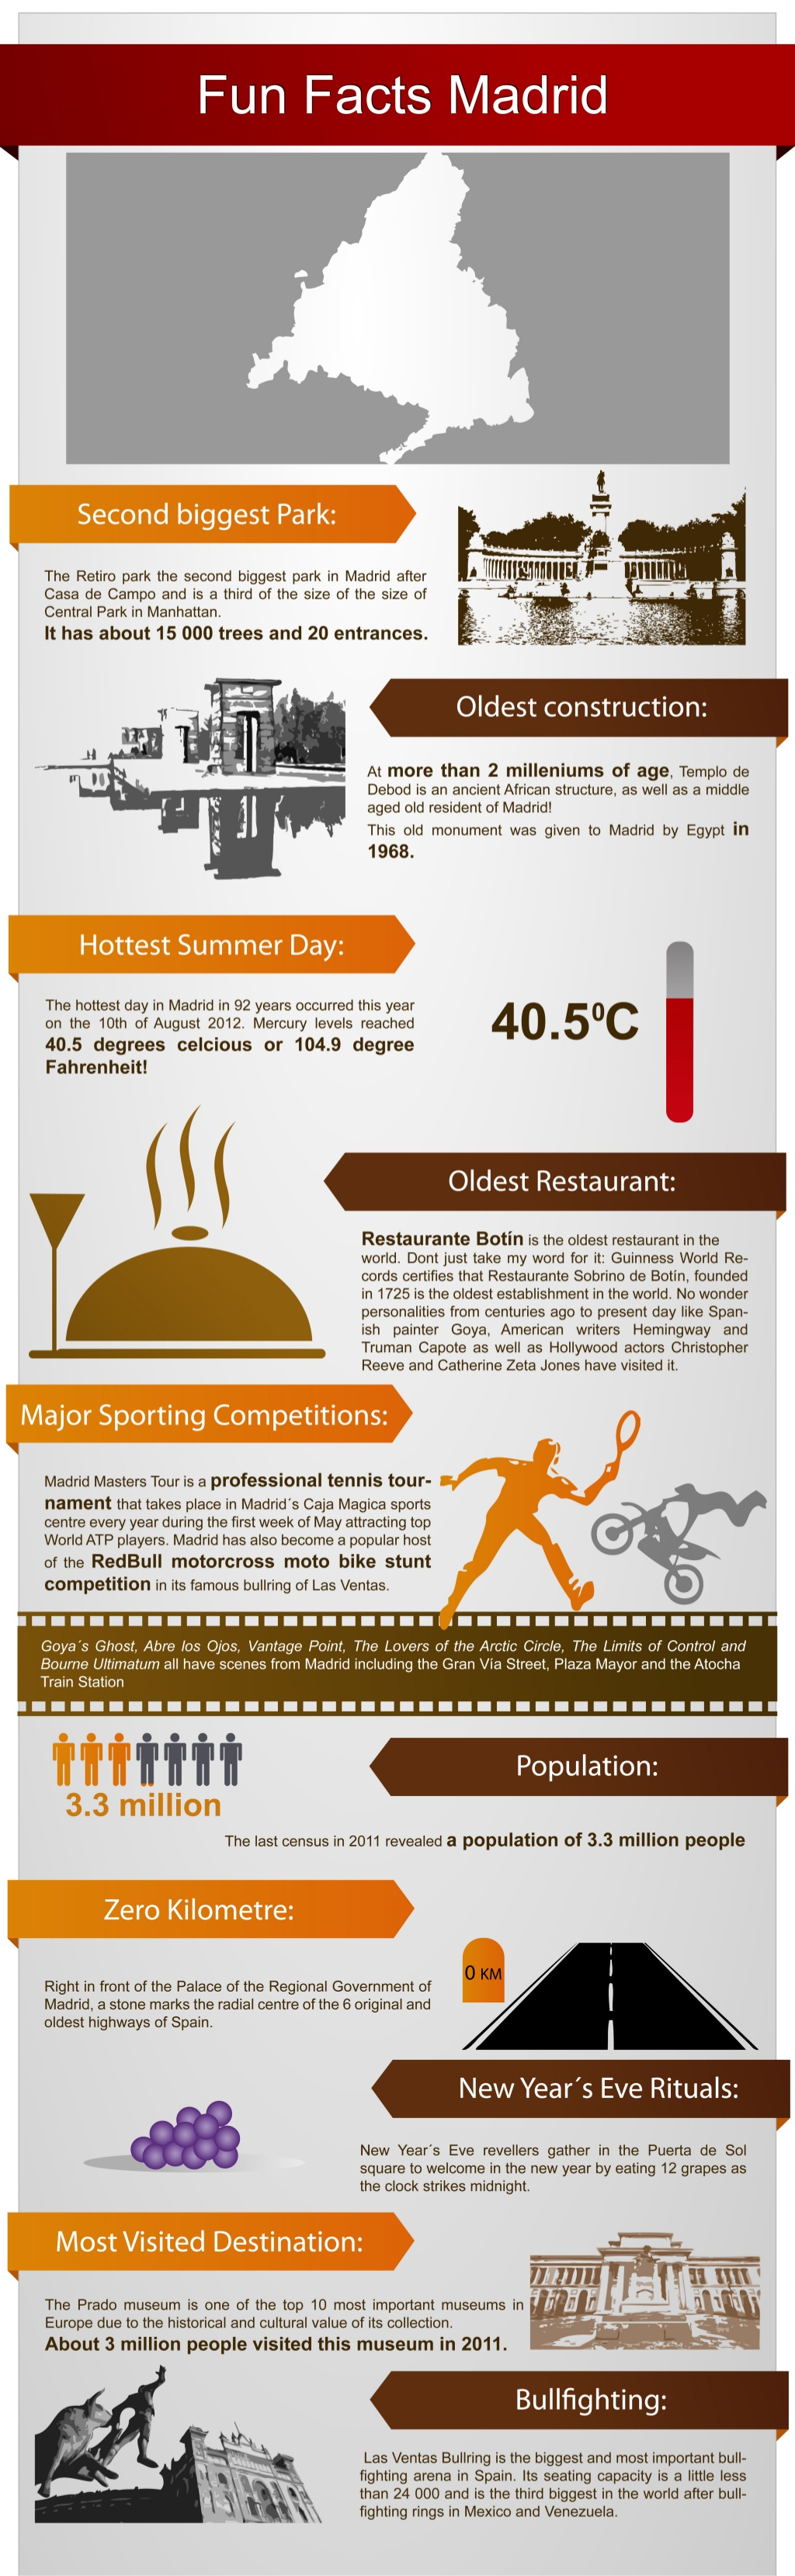 Fun Facts Madrid